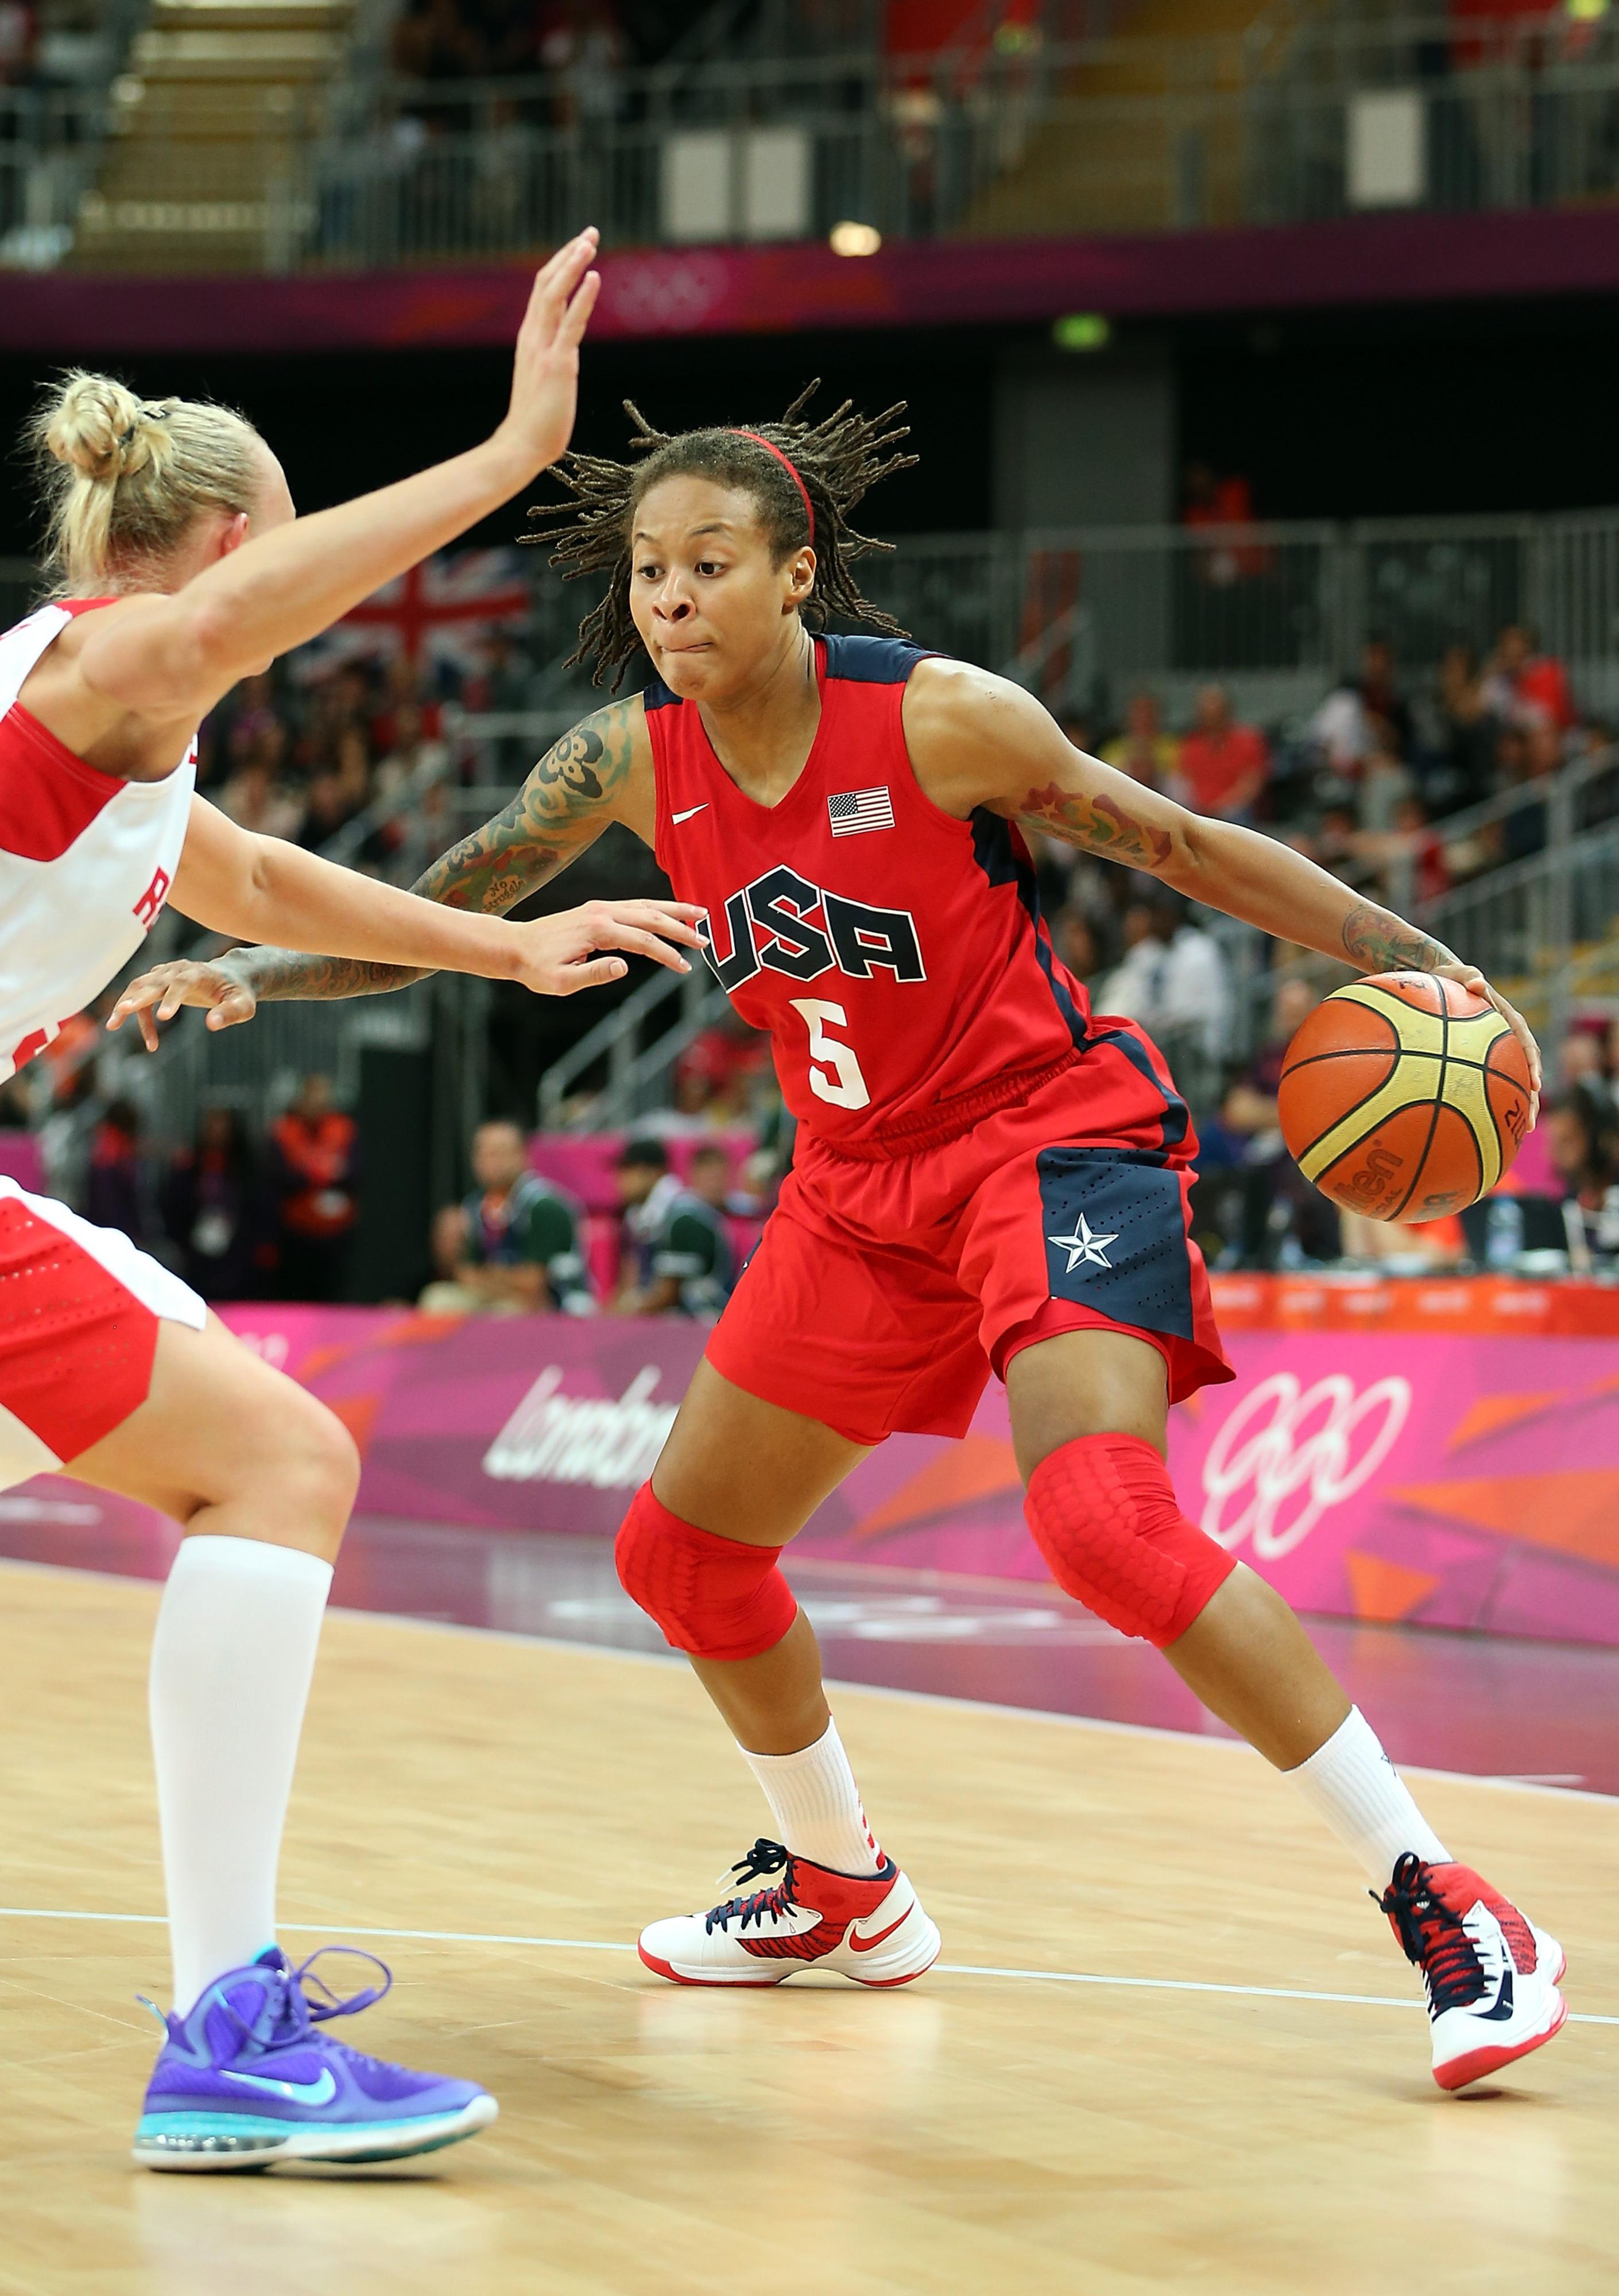 2012 Olympics Outsports Sbnation Com